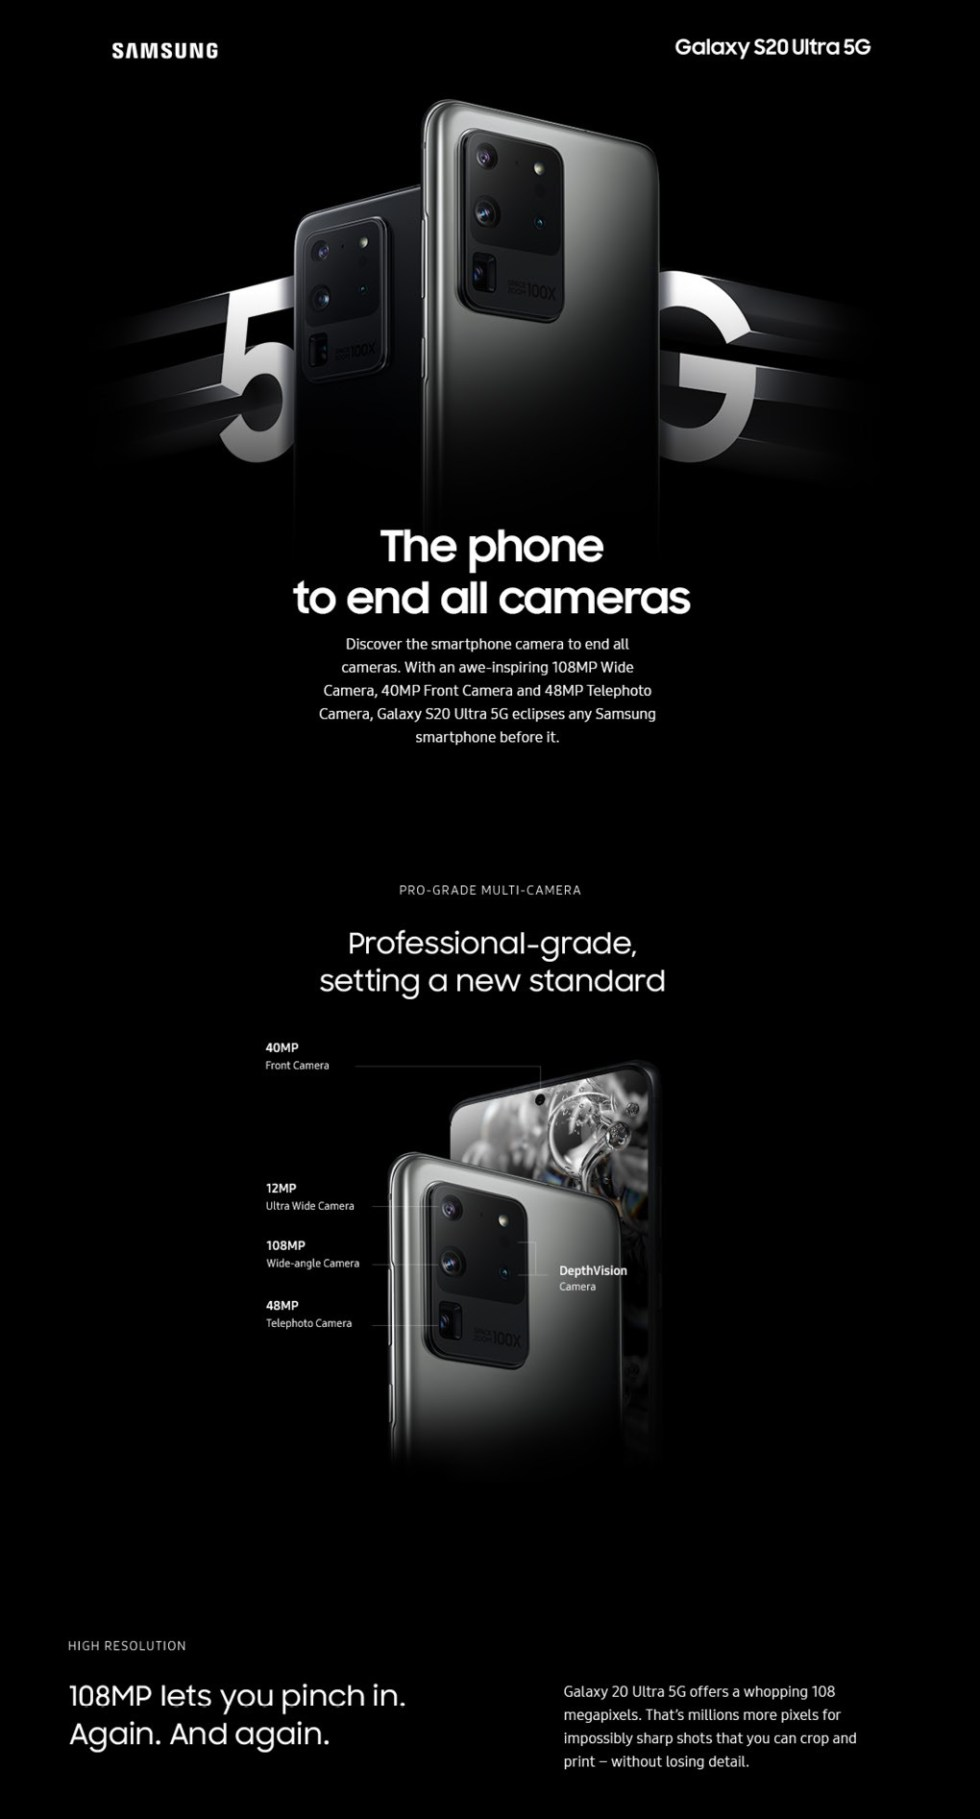 Samsung Galaxy S20 Ultra 5G Features